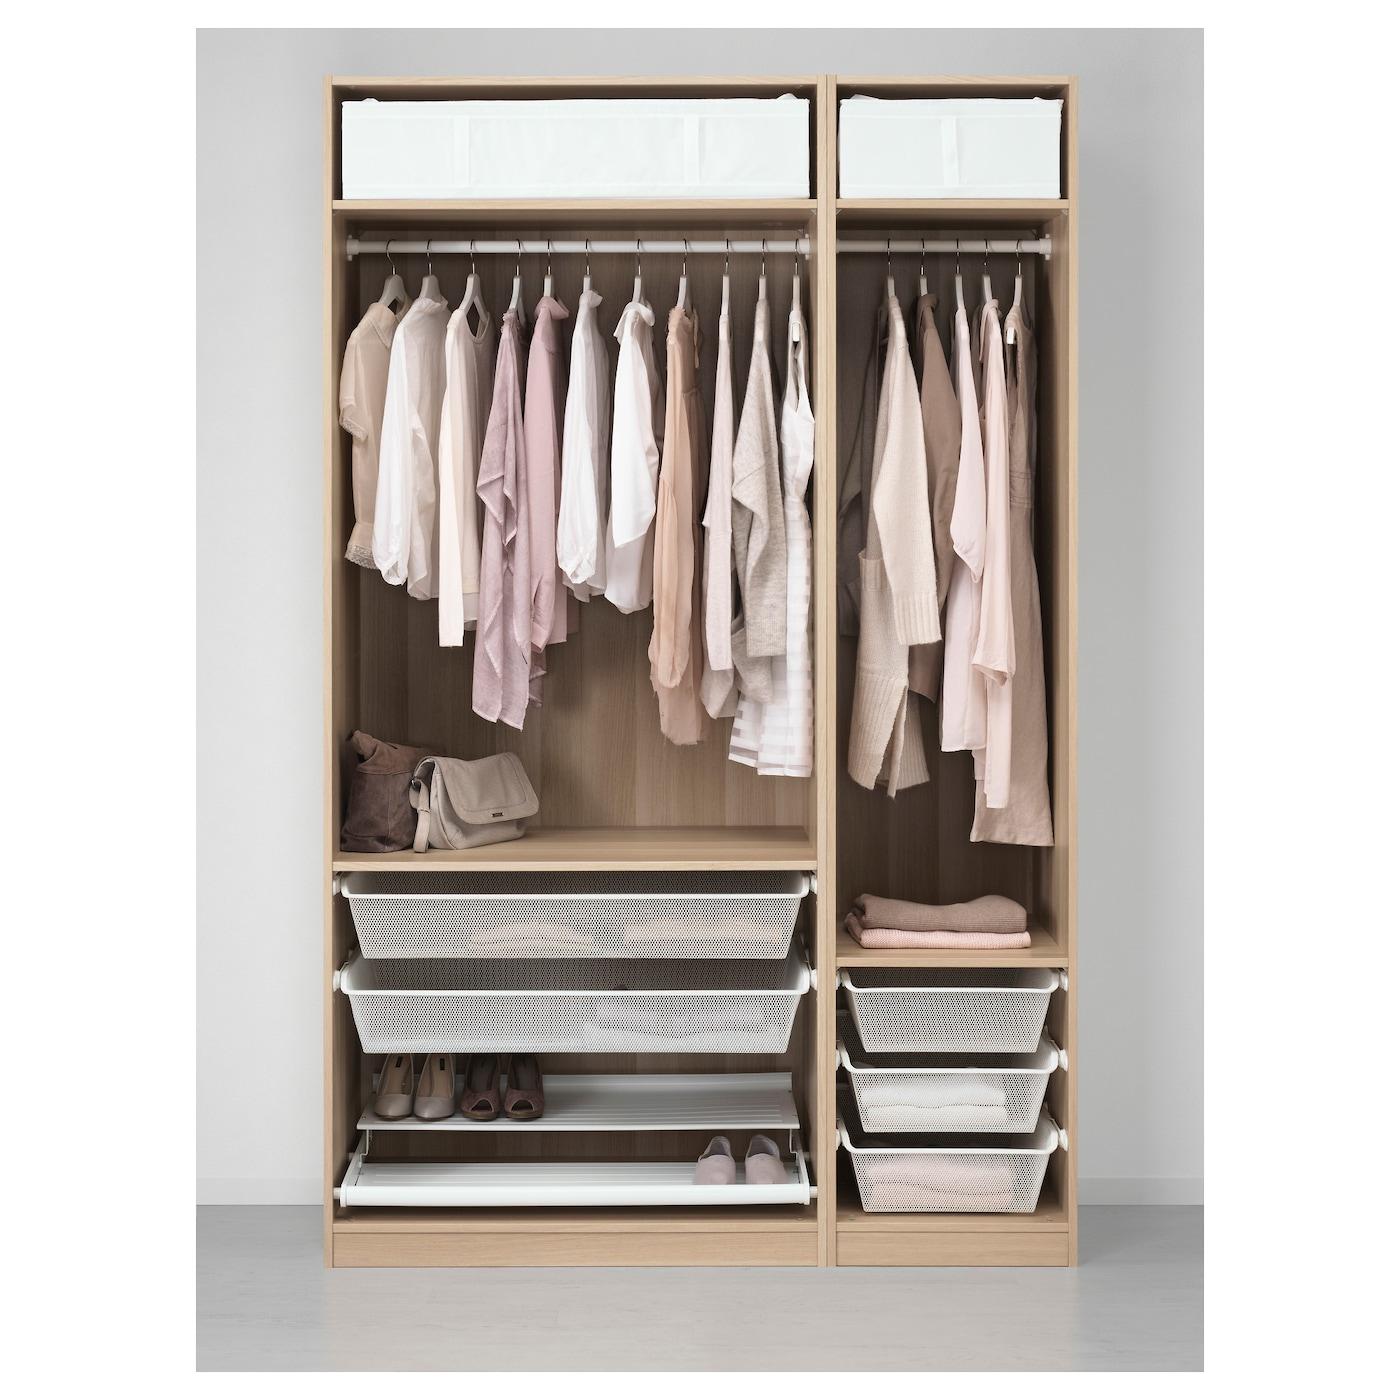 pax kledingkast wit gelazuurd eikeneffect 150x58x236 cm ikea. Black Bedroom Furniture Sets. Home Design Ideas